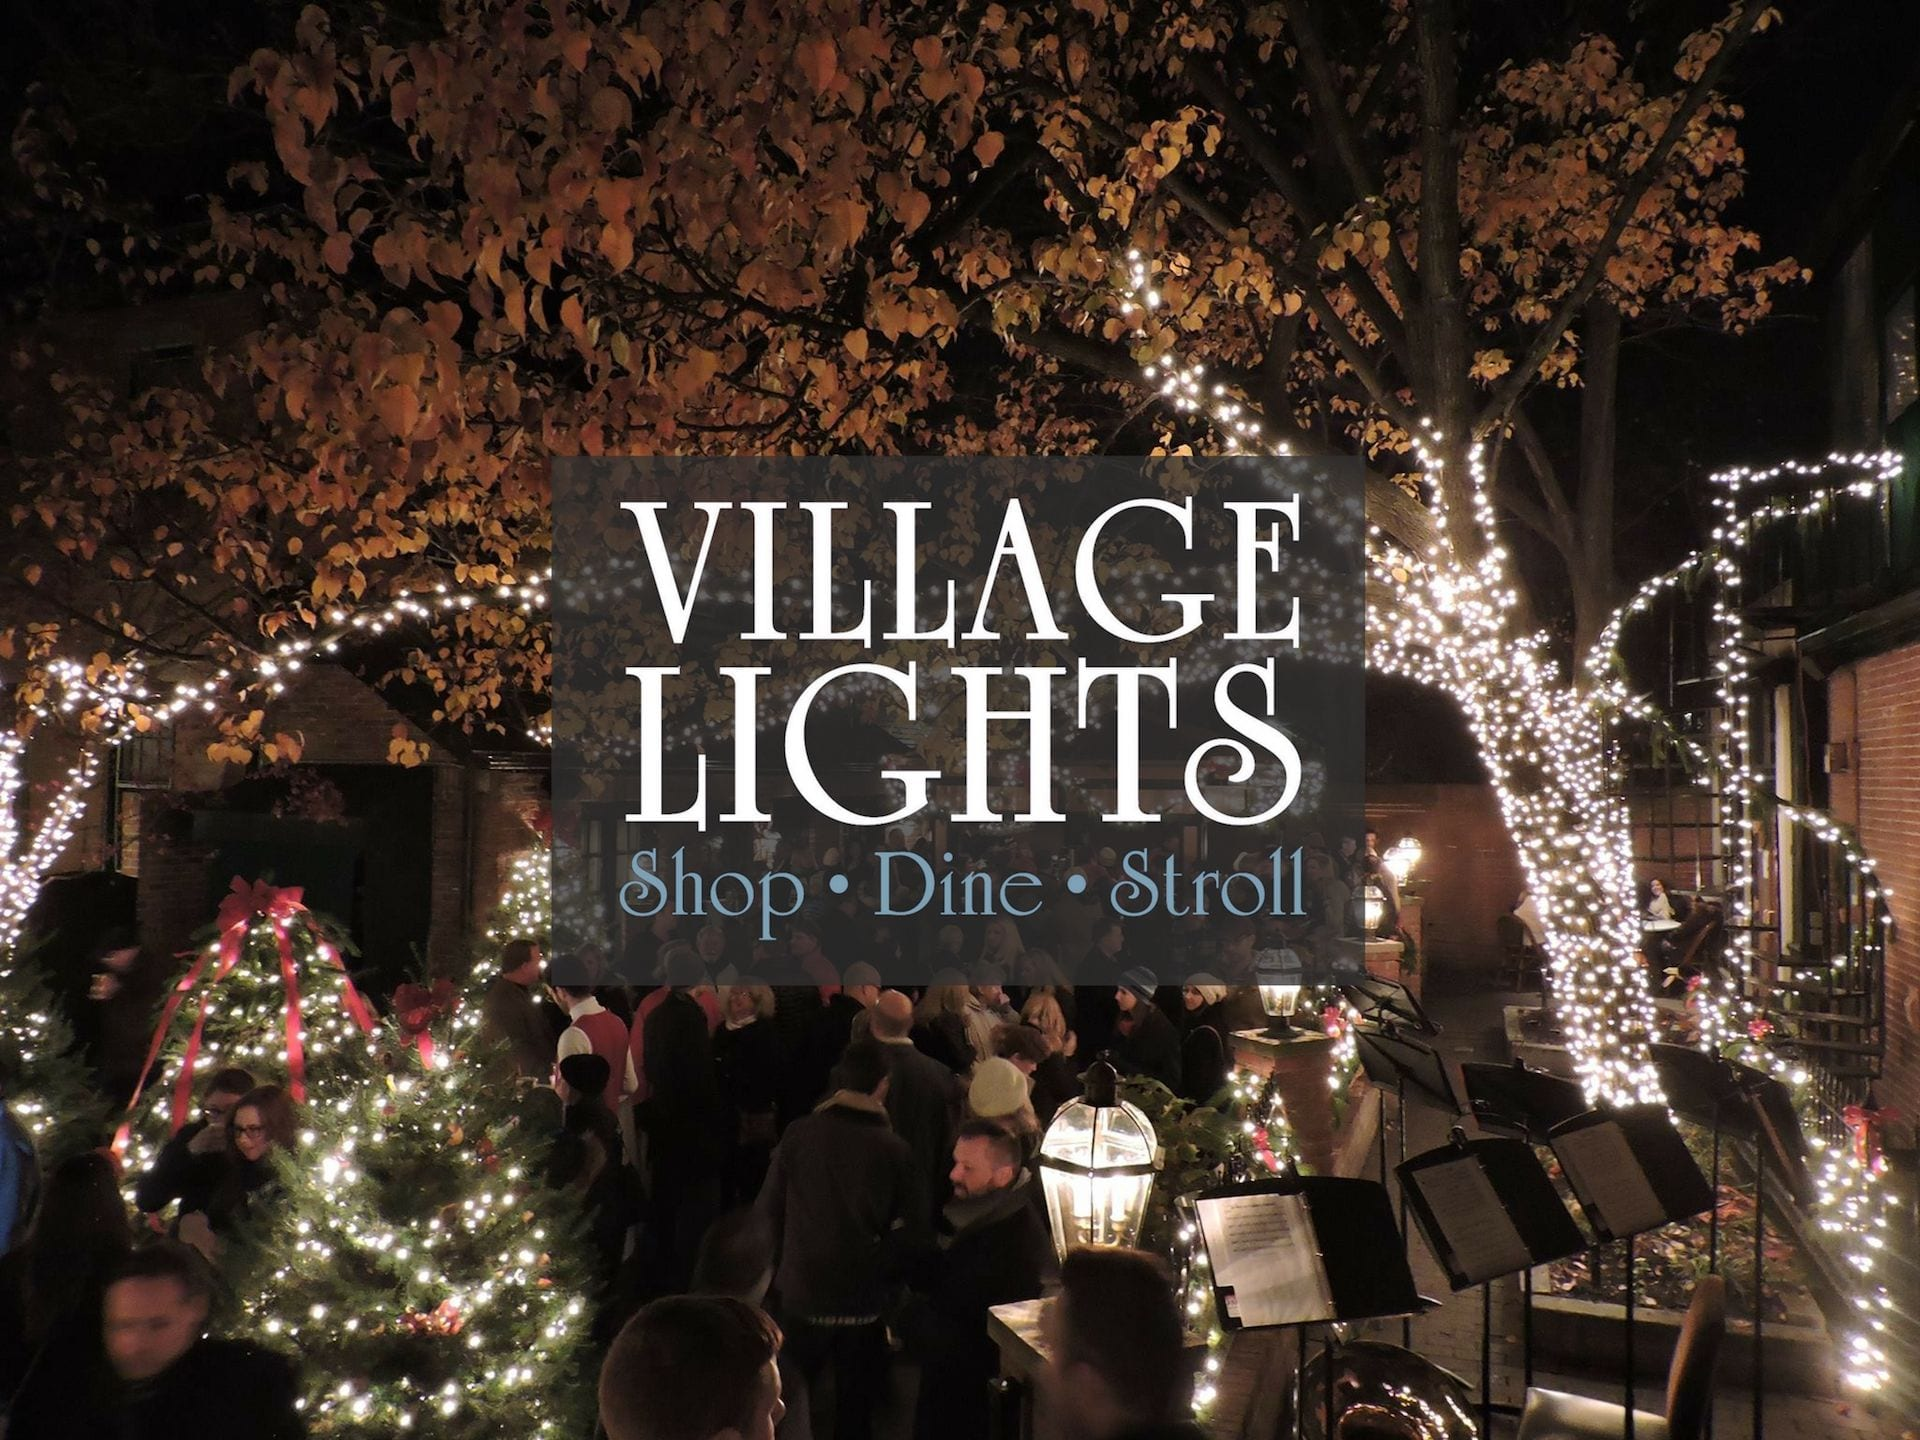 Columbus Ohio In Christmas 2020 Village Lights Village Lights 2019 | German Village Society